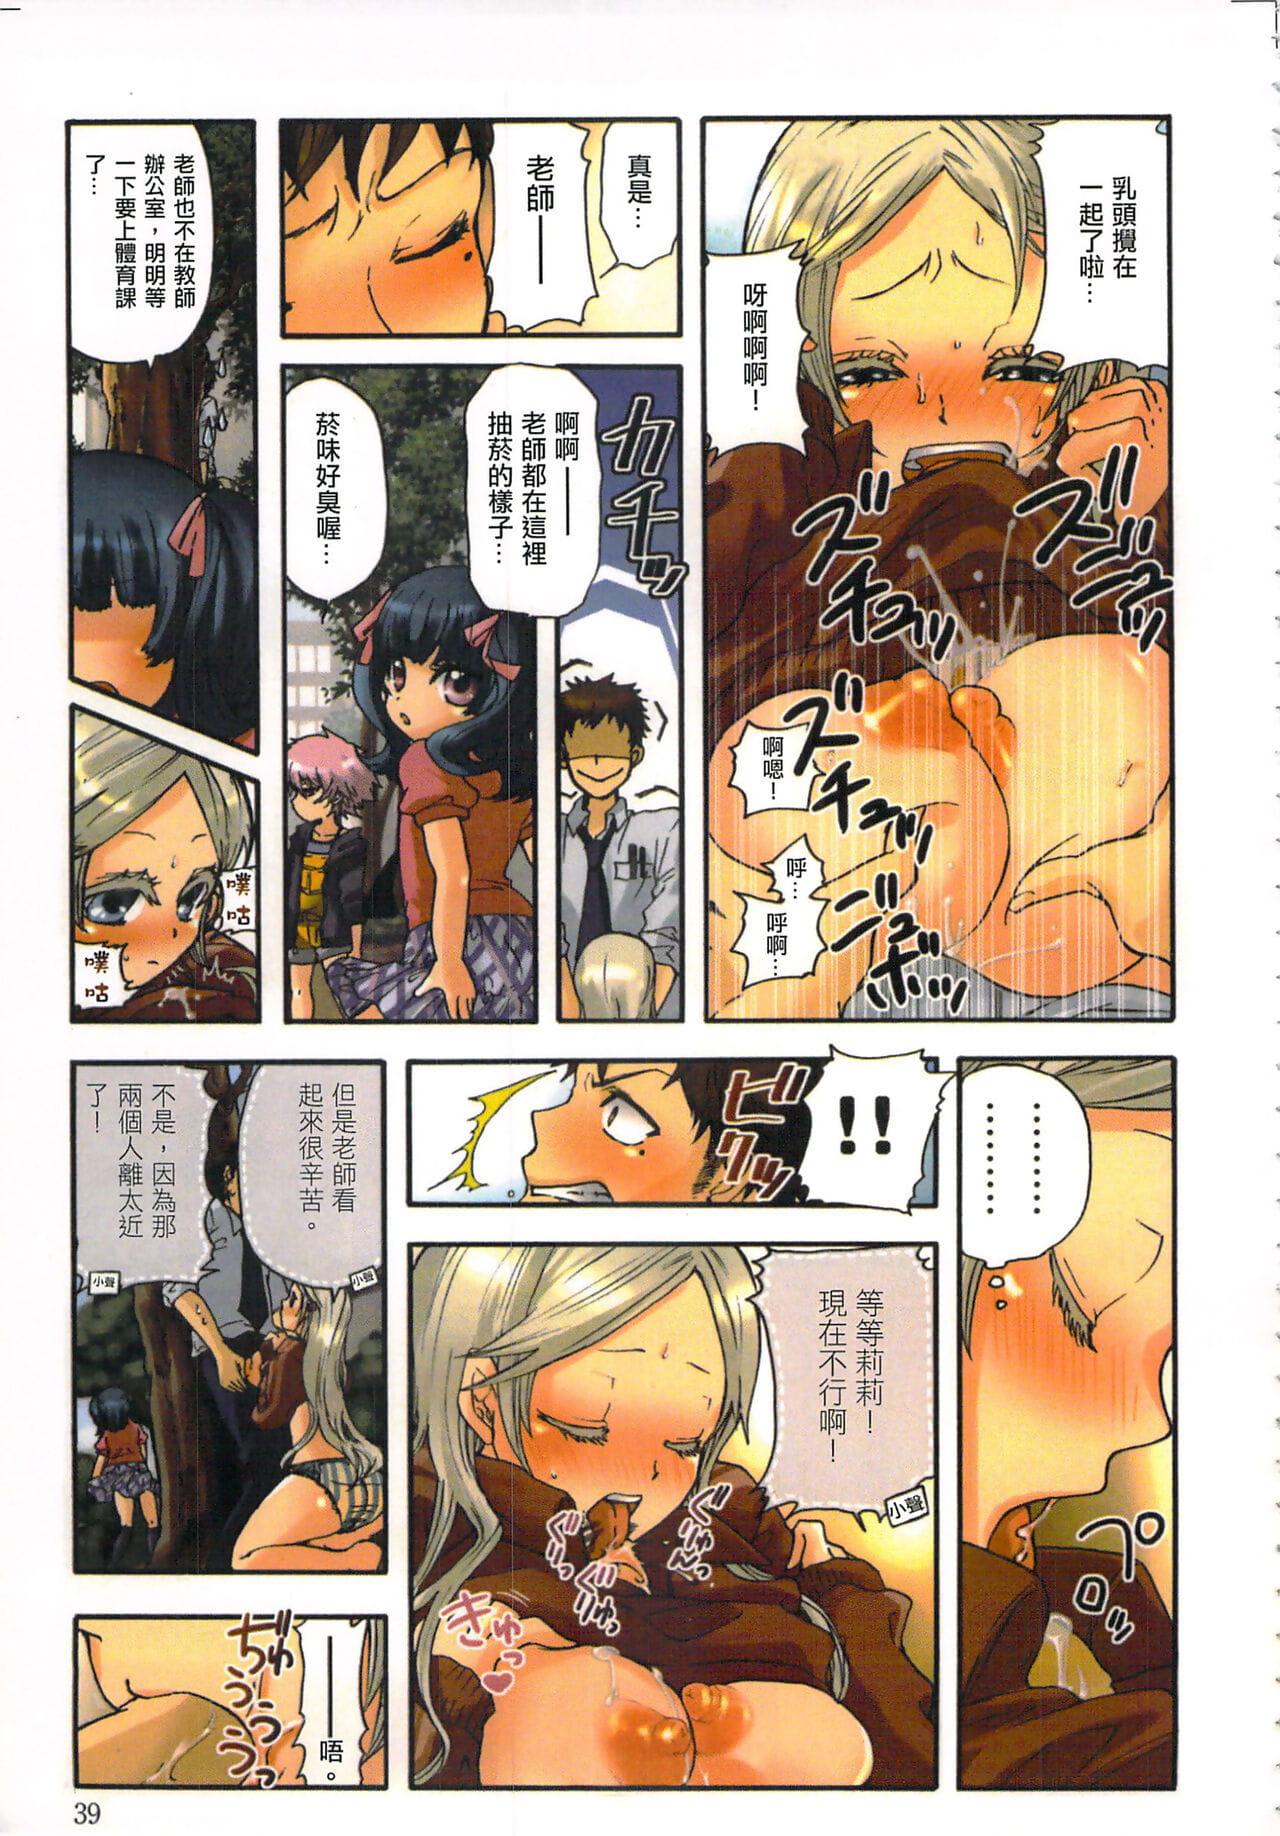 Satou Saori Aigan Self-regulating Lilly - Cosset Self-regulating Lilly Vol. 1 - 性愛ROBOT 莉莉 Vol. 1 Chinese - ornament 3